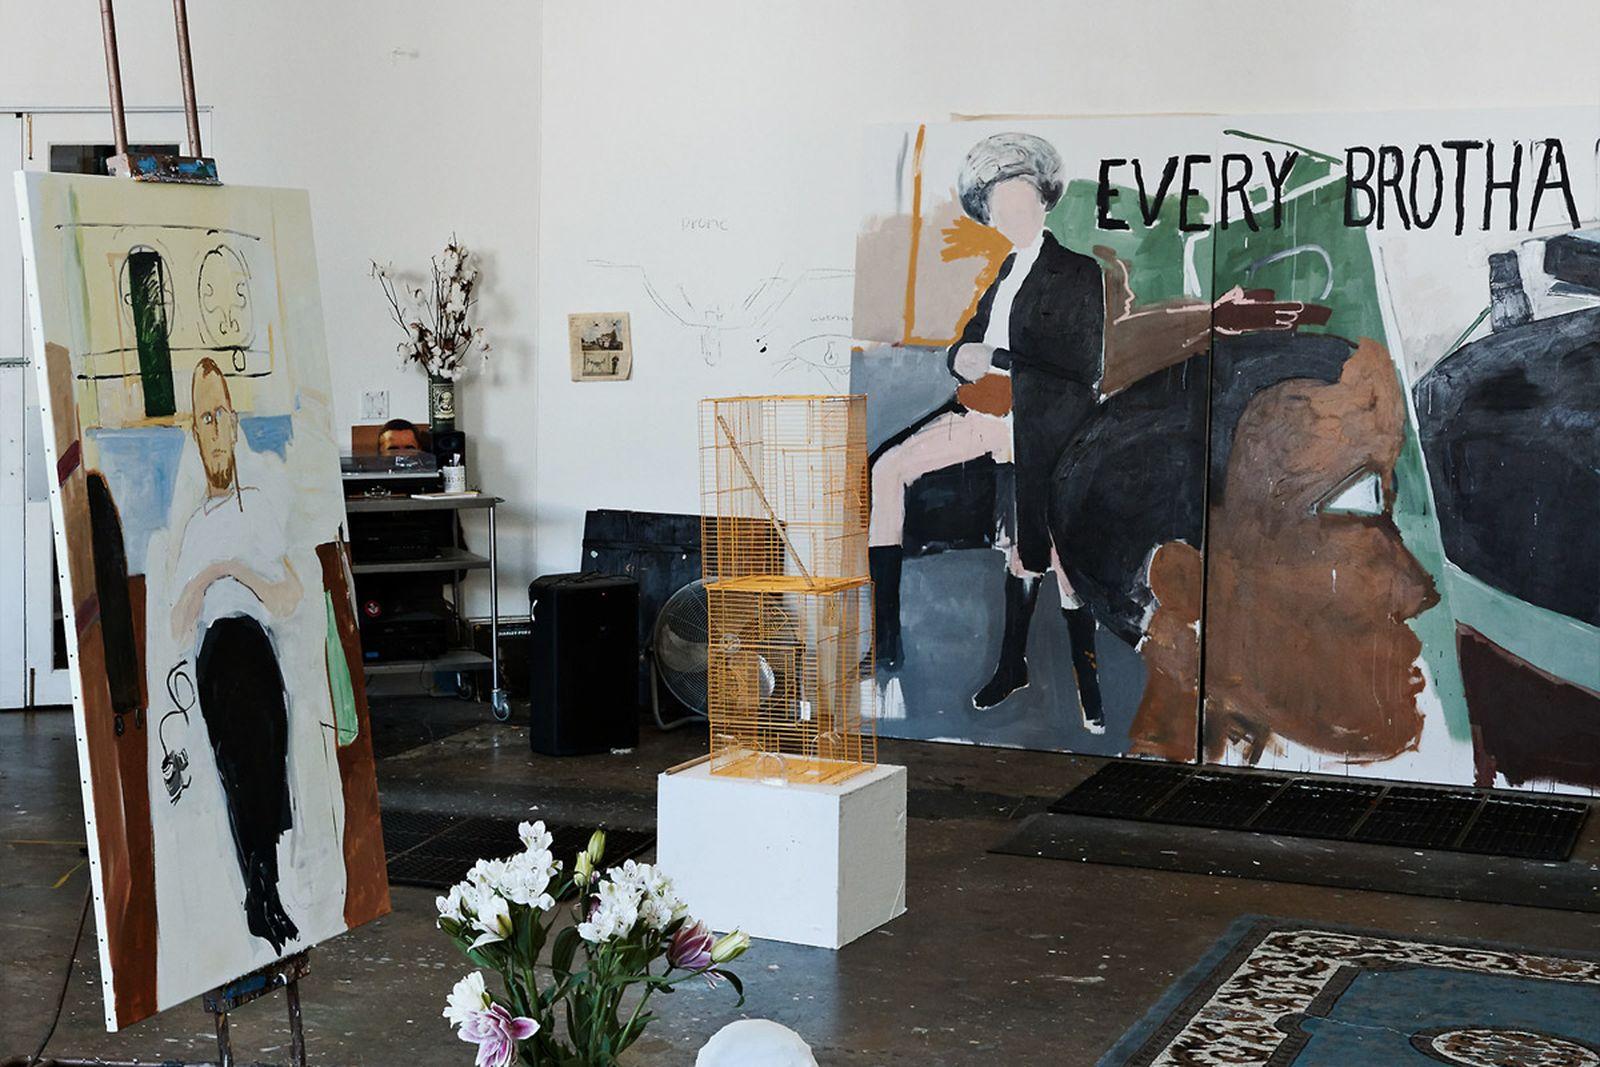 louis-vuitton-temporaray-artist-residency-nyc-05